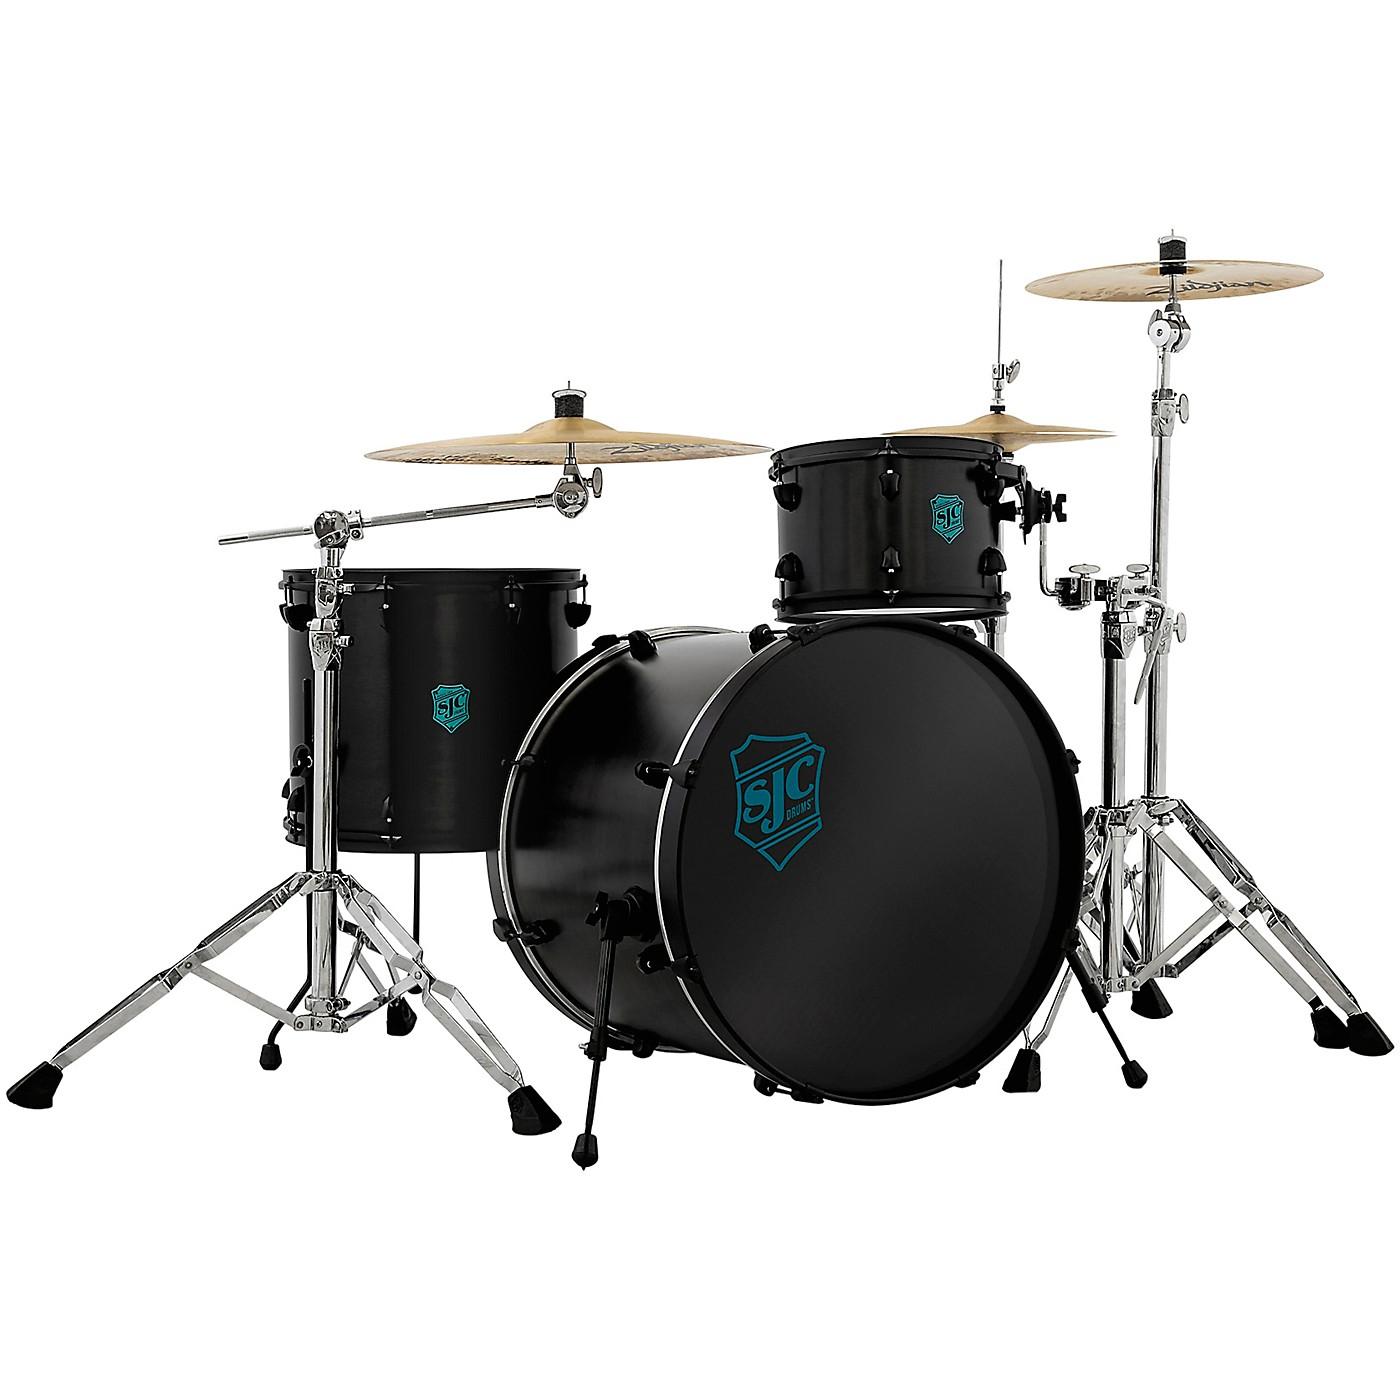 SJC Drums 3-Piece Pathfinder Shell Pack thumbnail